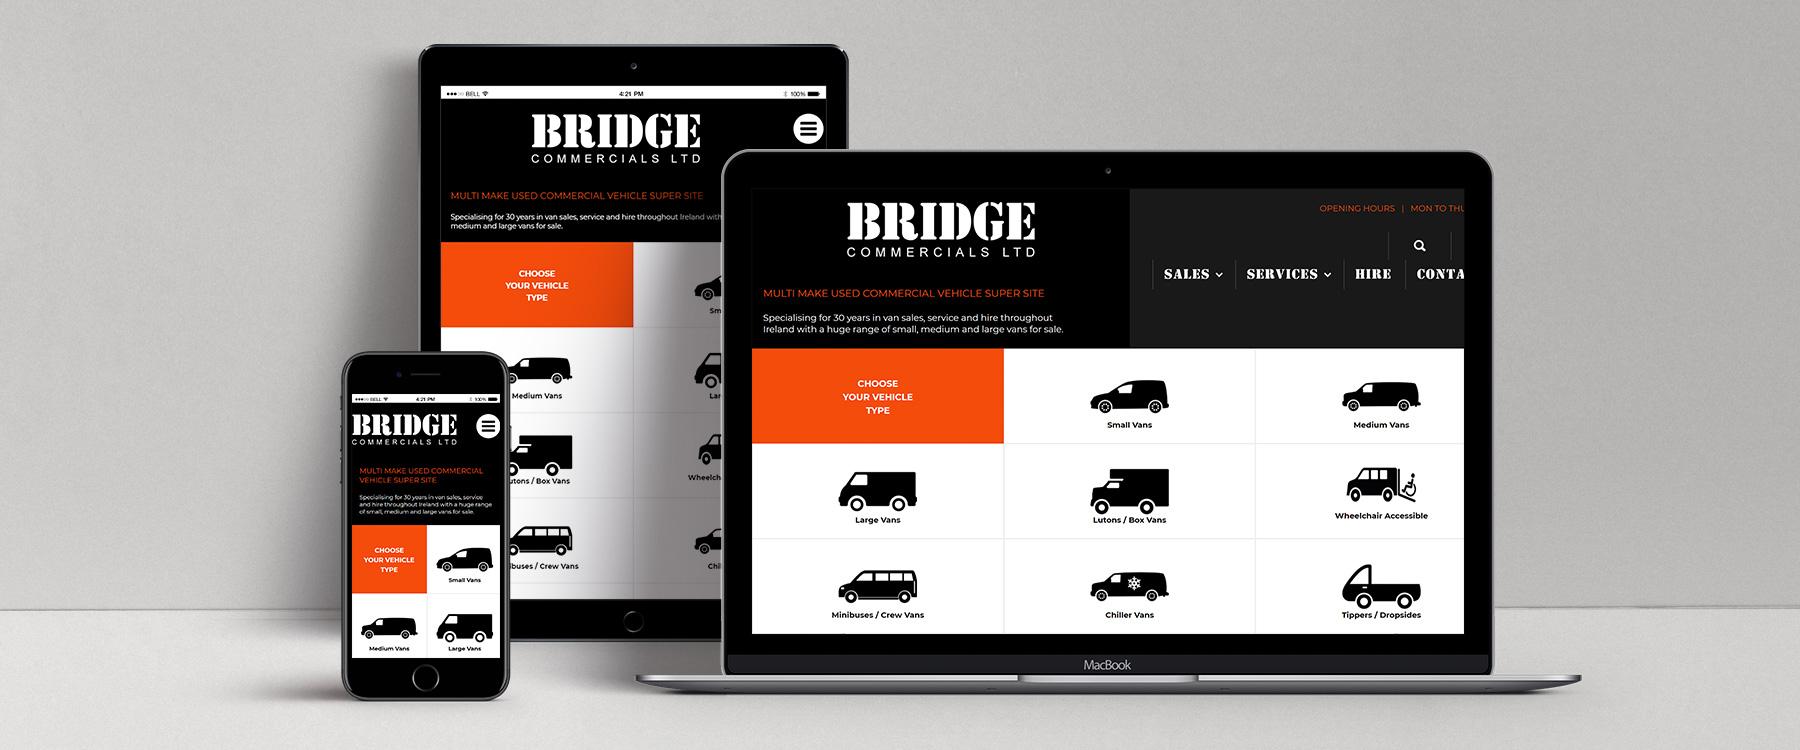 Bridge Commercials Image First